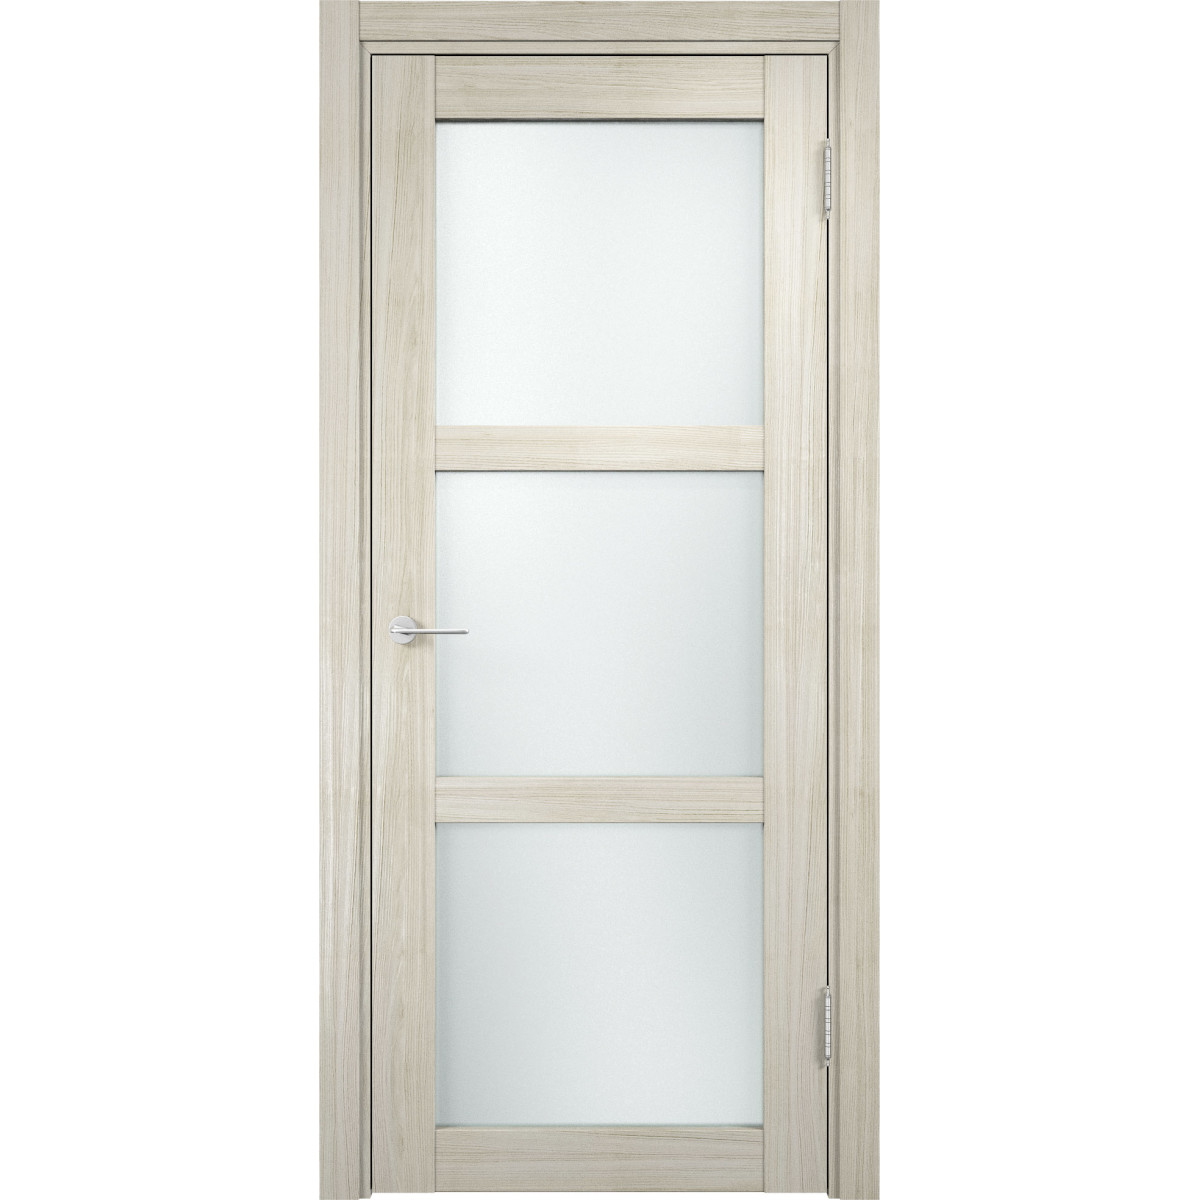 Дверное полотно Casaporte Рома МП_0098 2000х900х44 мм МДФ